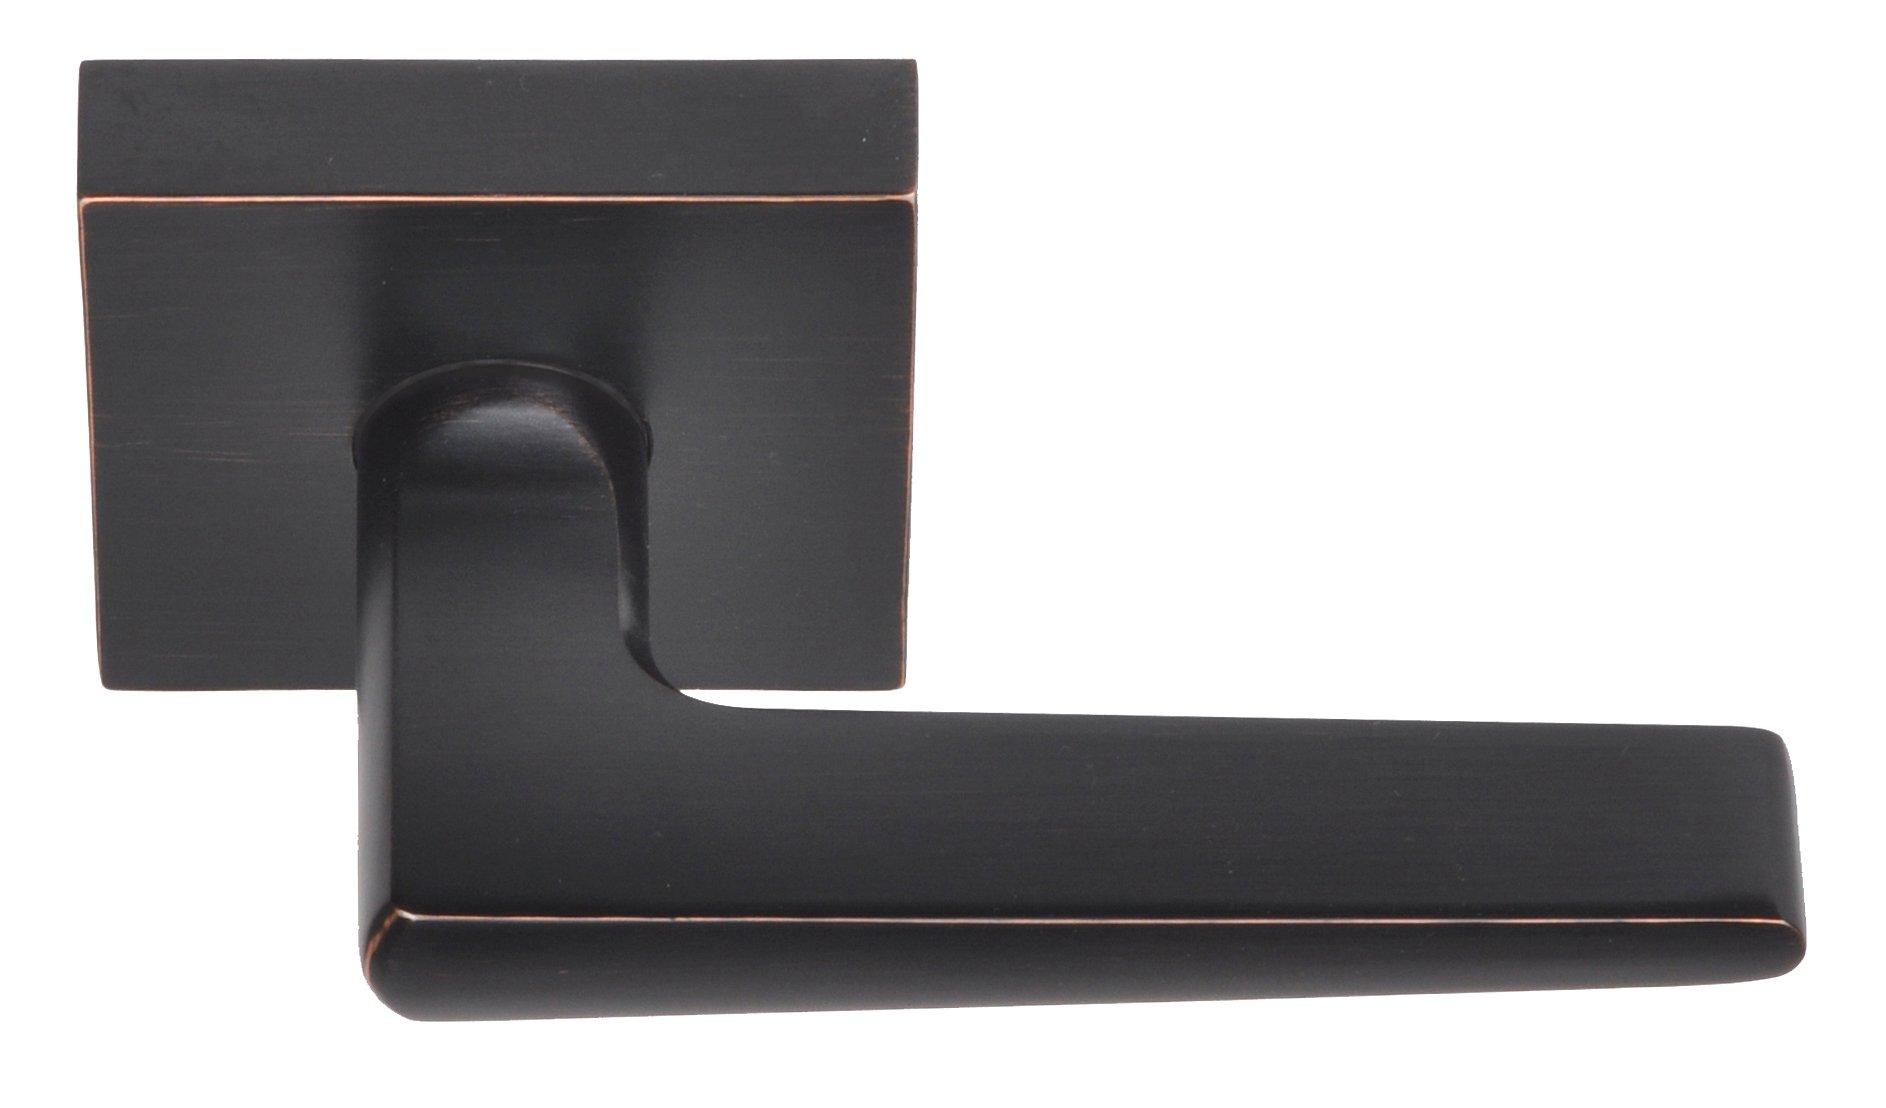 Better Home Products Tiburon Reversible Passage Lever, Dark Bronze